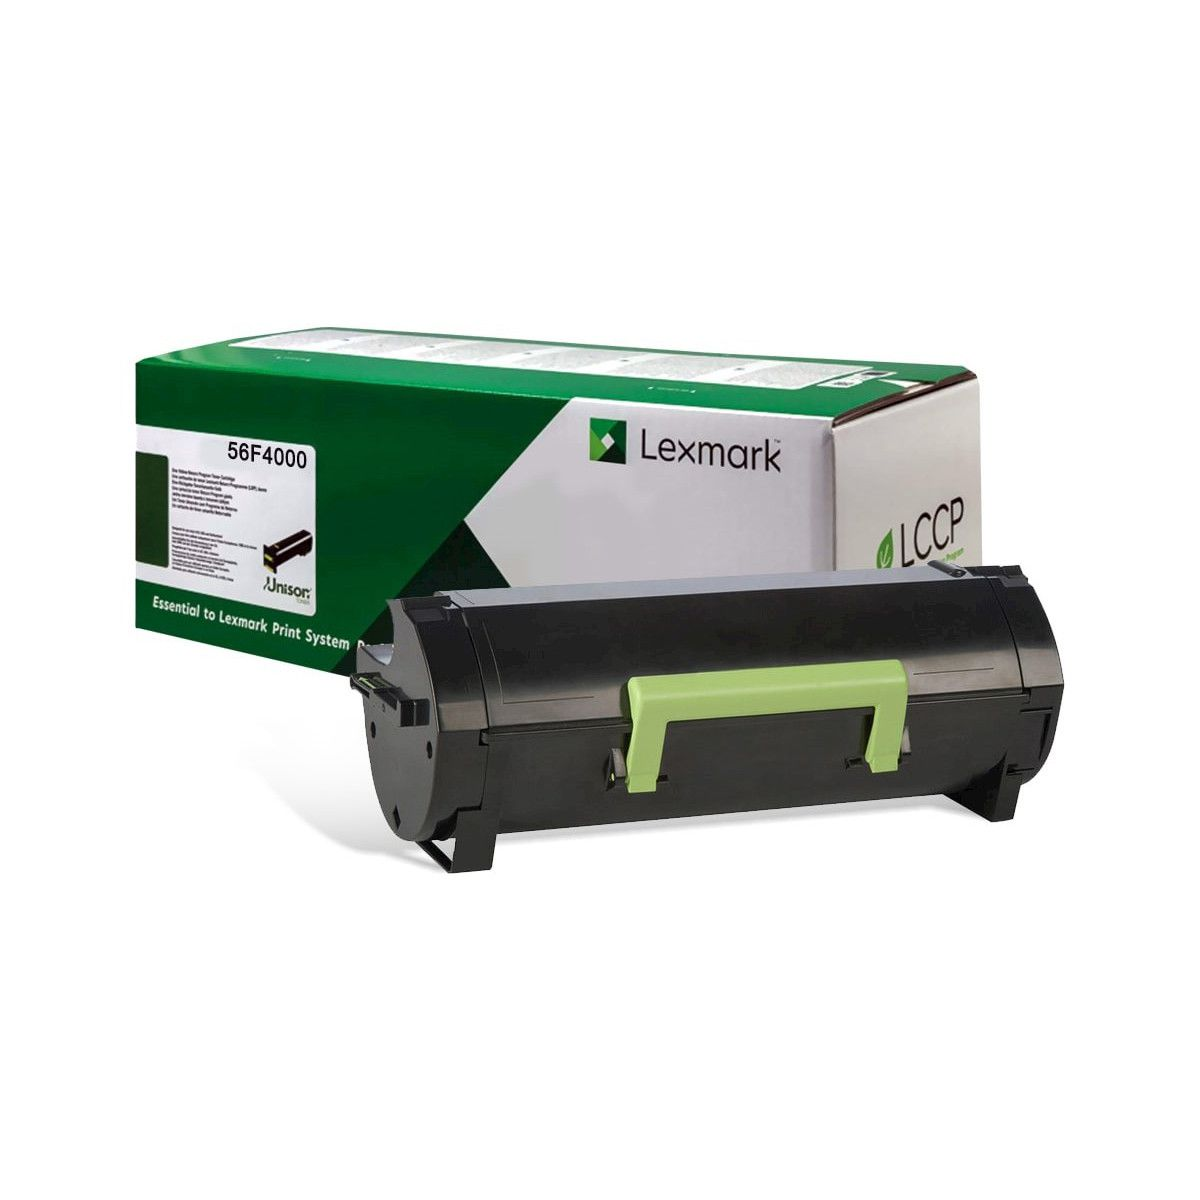 Toner Lexmark Original 56FB000 56F4000 56FB MS521 MX521 MS621 MX522 MS622 MX622 MS321 MX321 6K